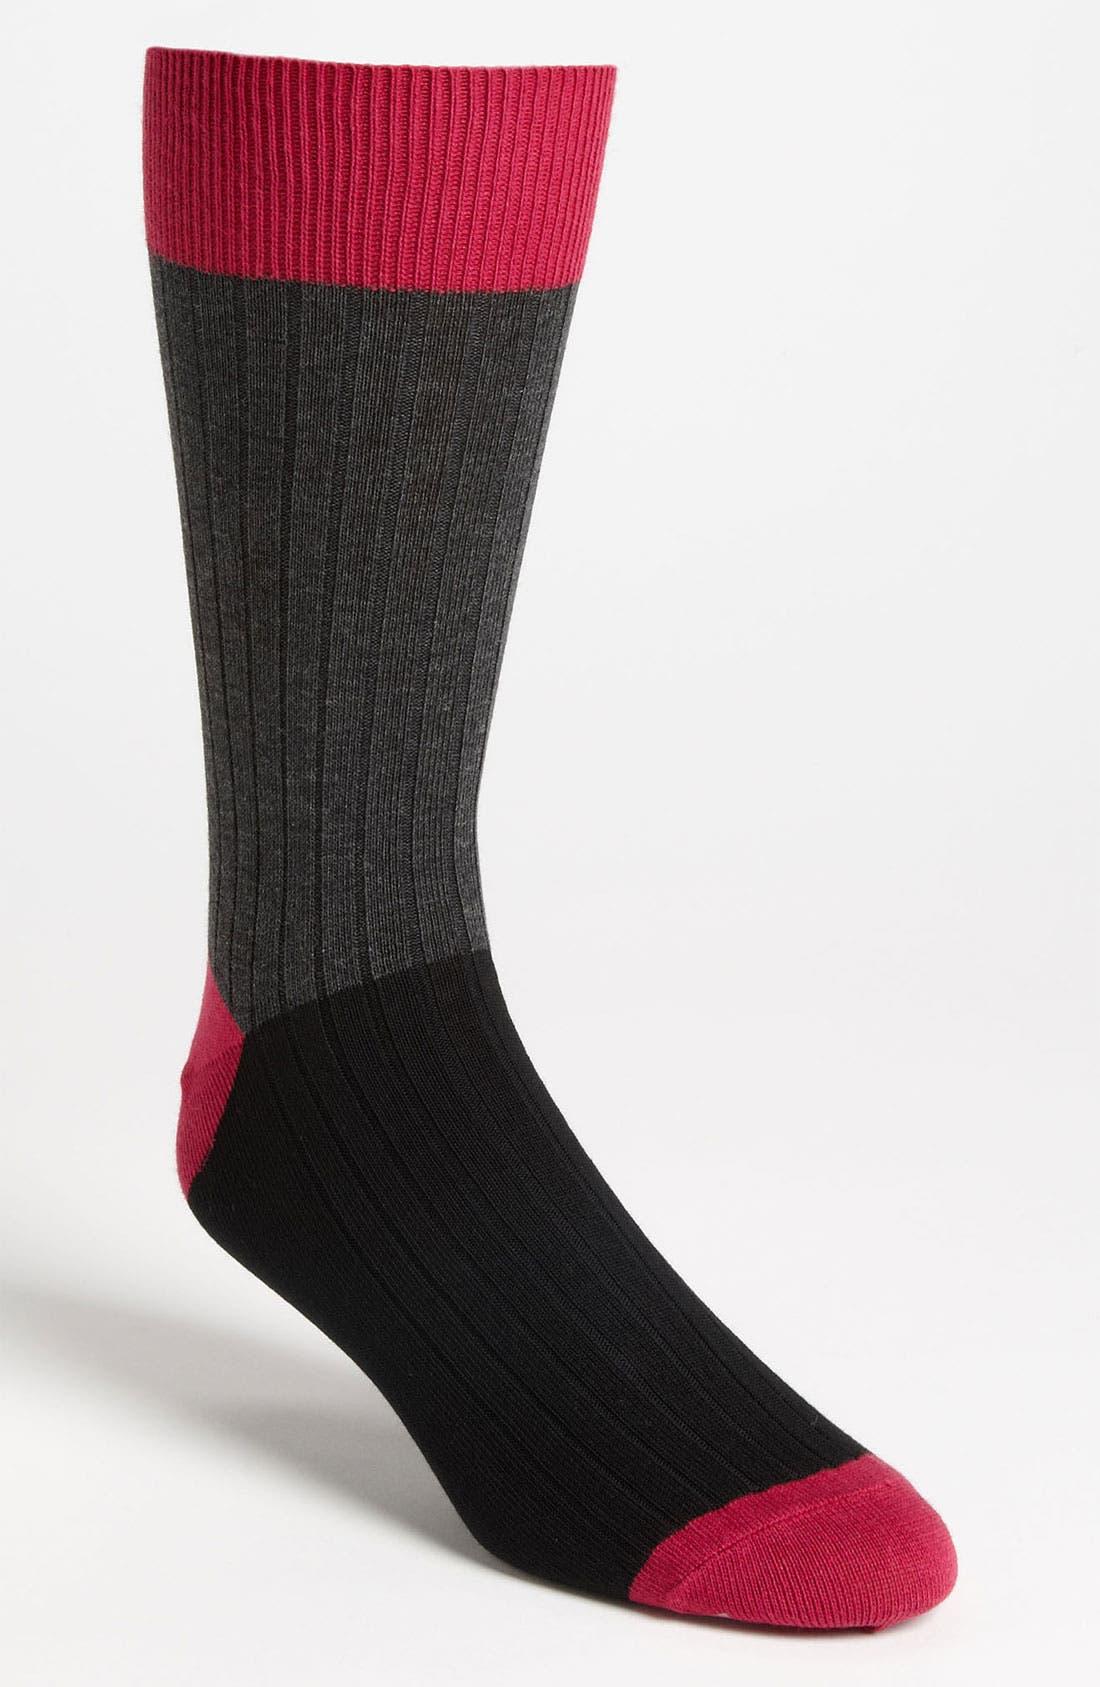 Main Image - Cole Haan 'Work to Play' Socks